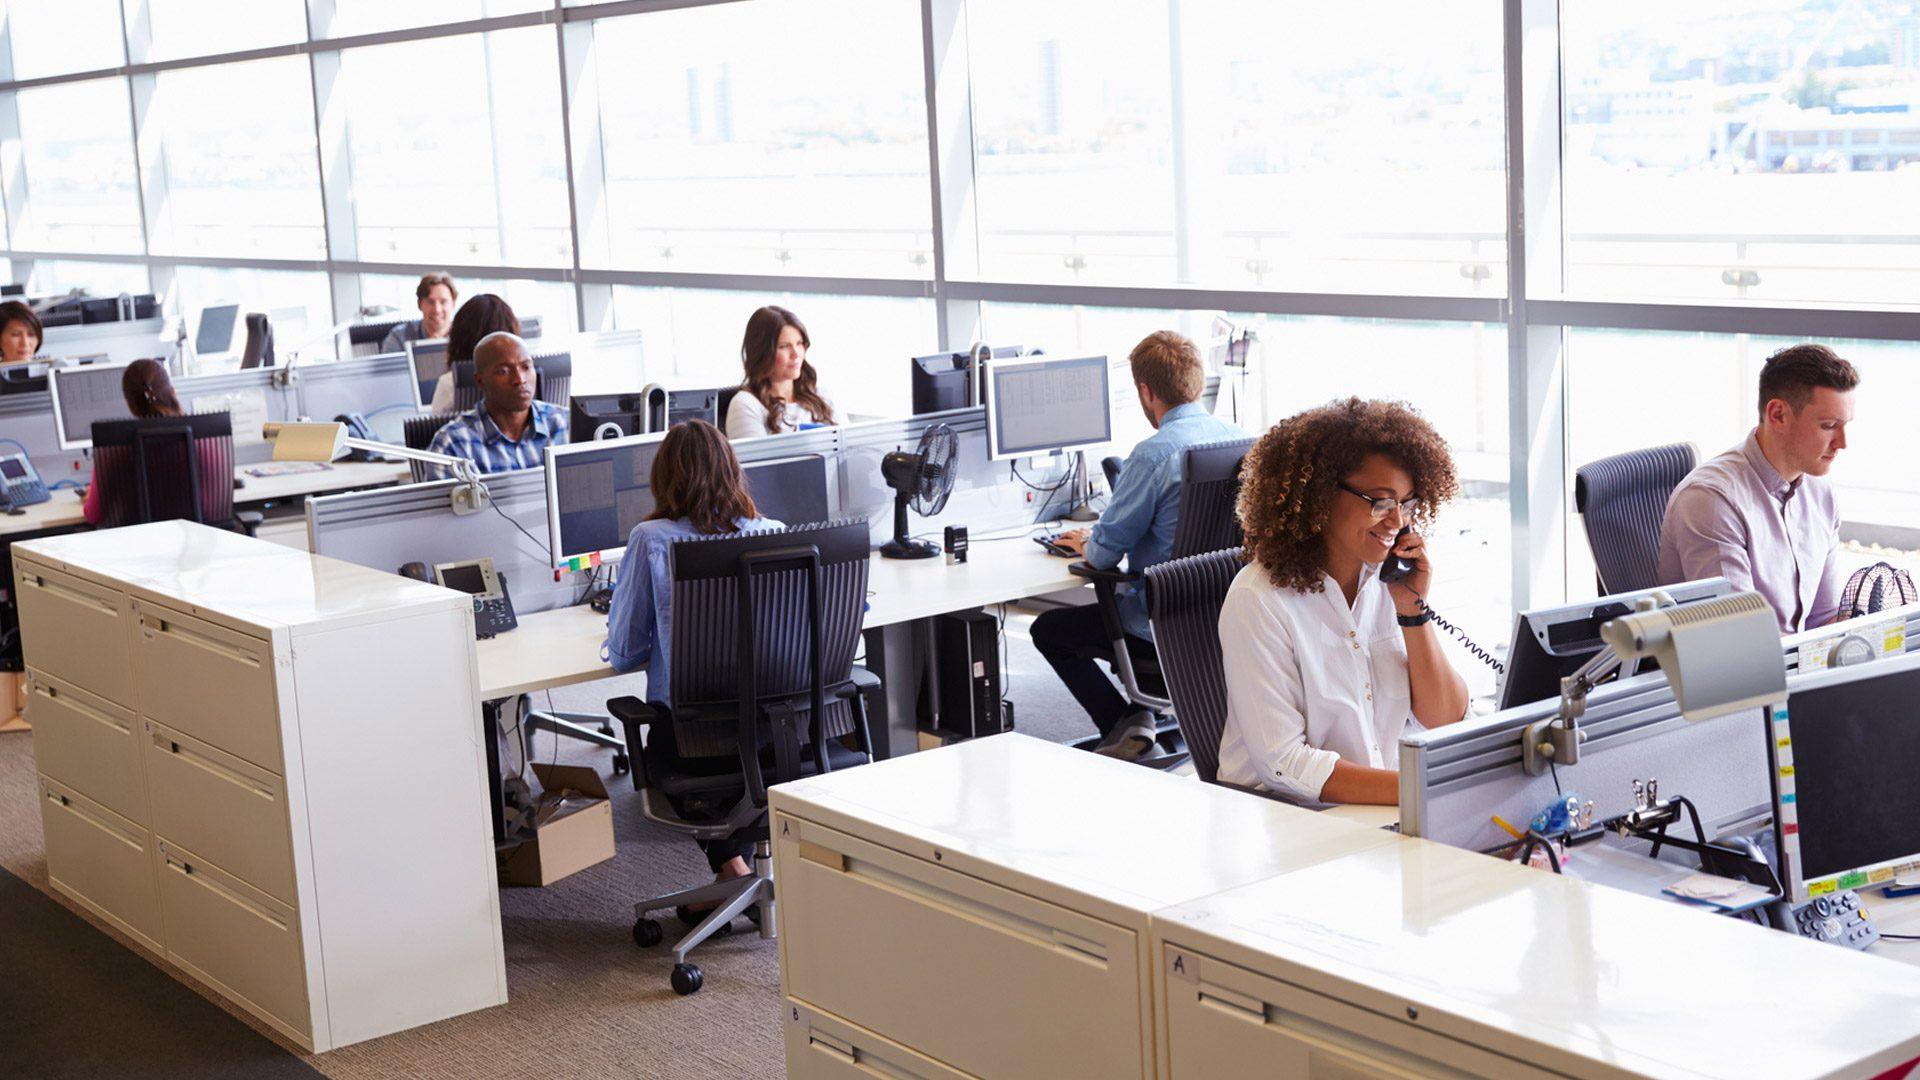 working behaviour in open plan office space